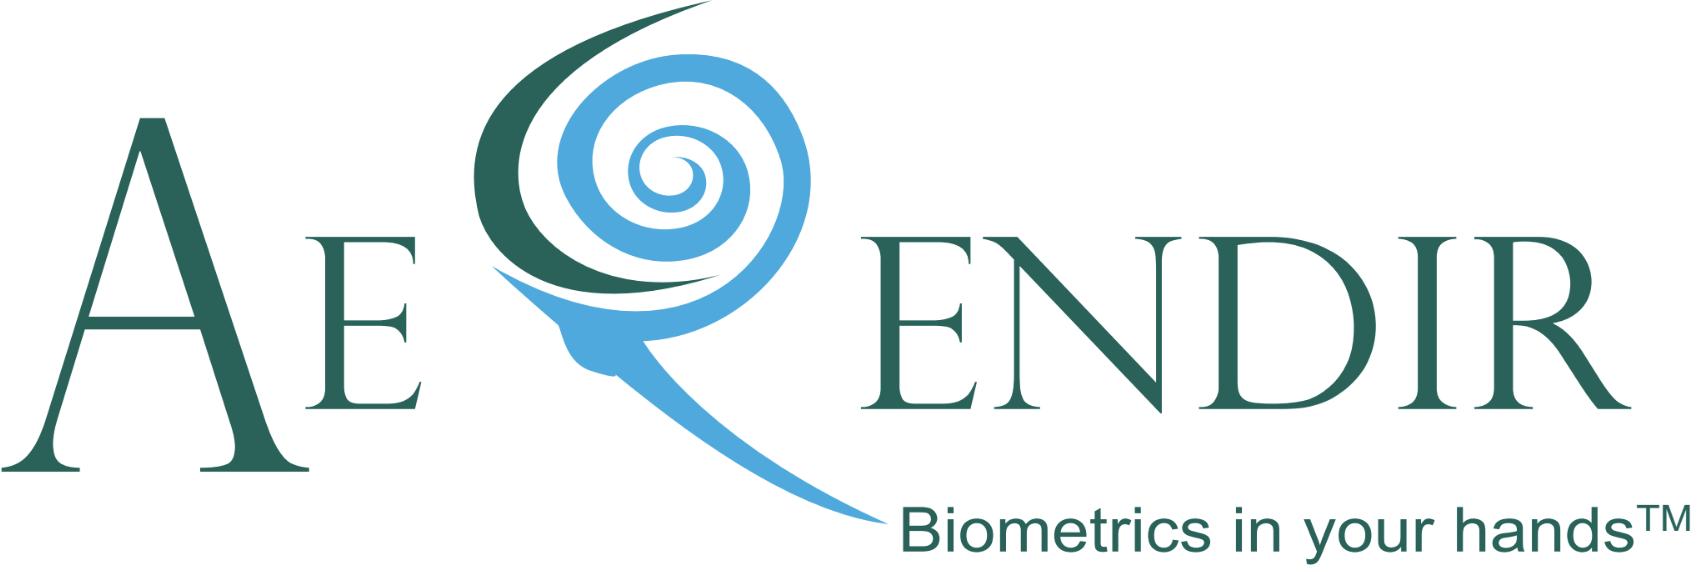 Aerendir-logo.png